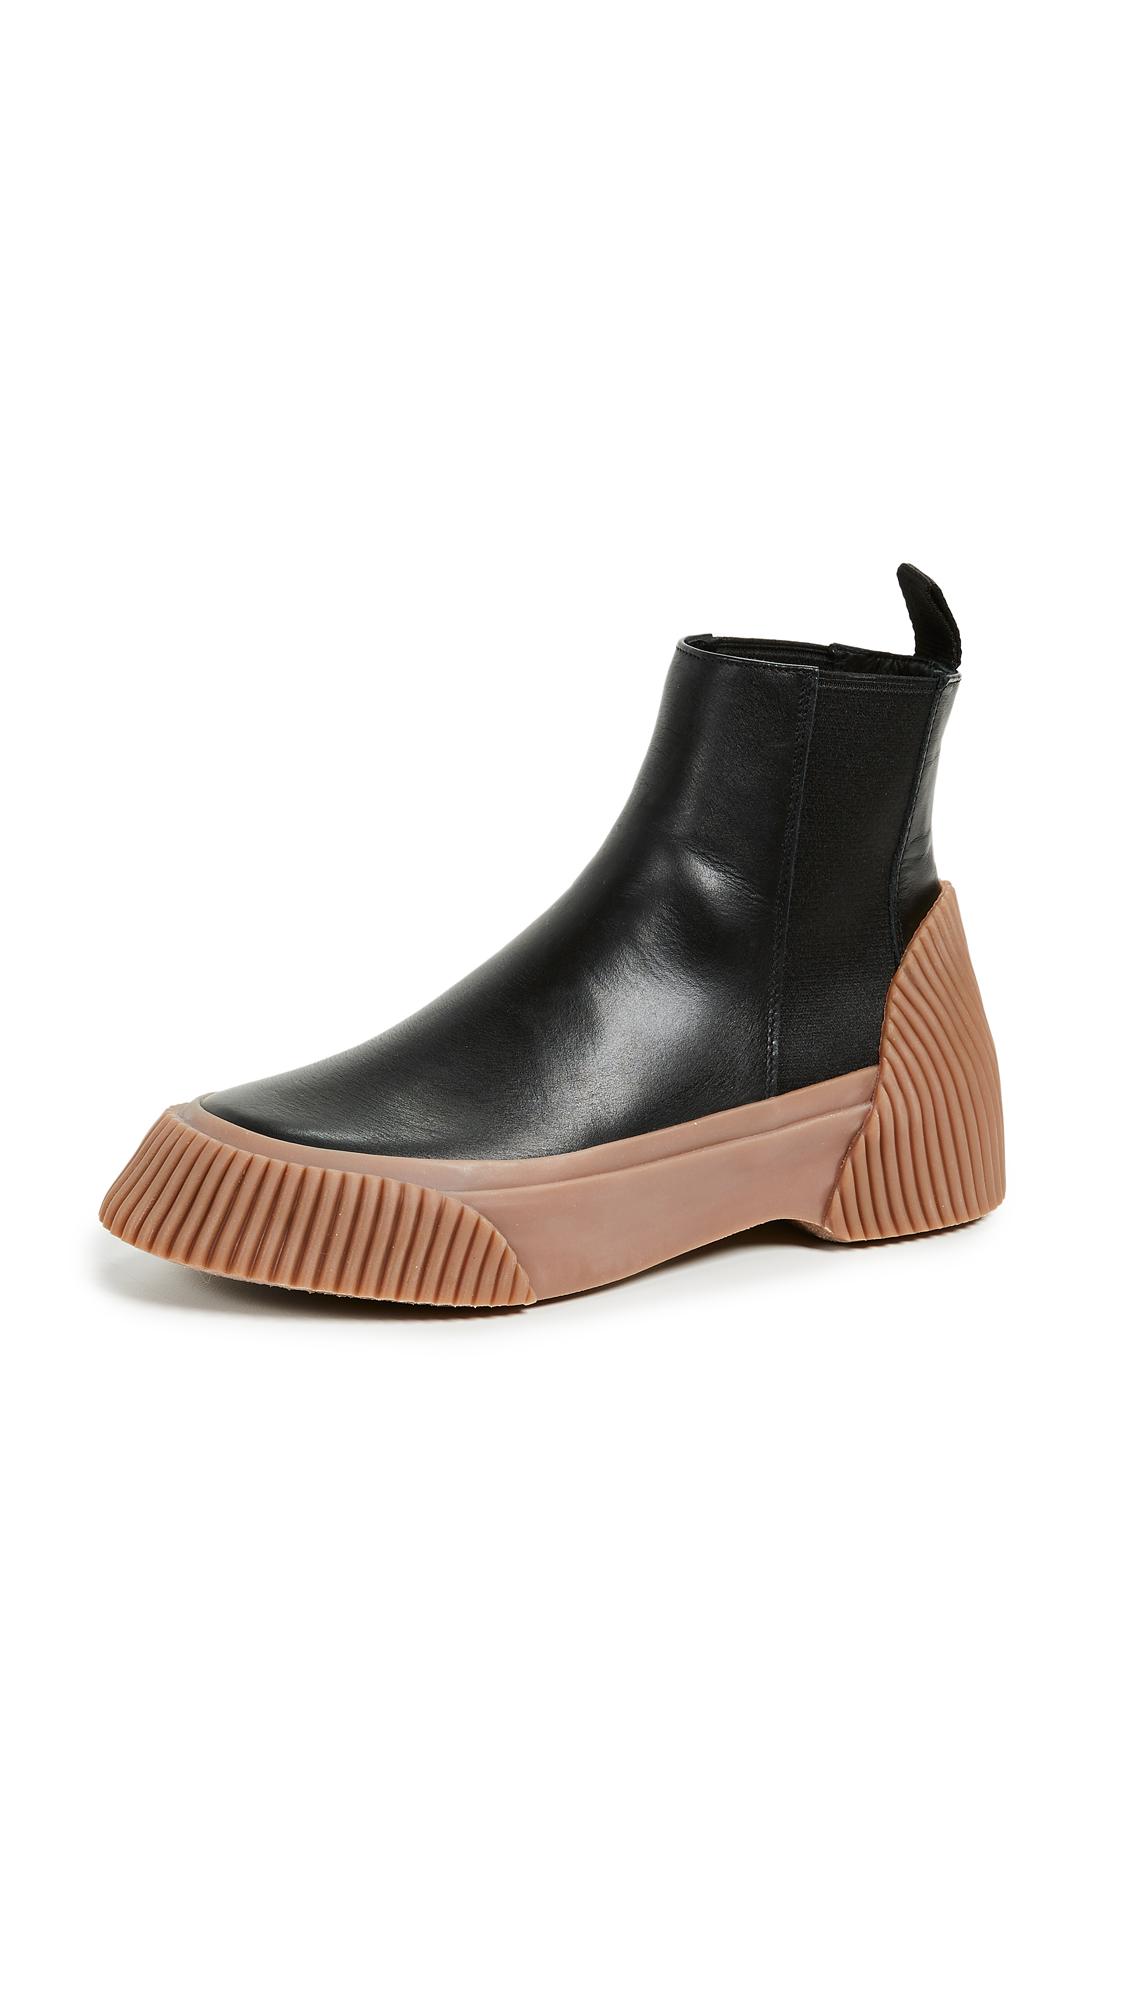 3.1 Phillip Lim Lela Vulcanized Chelsea Boots - Black